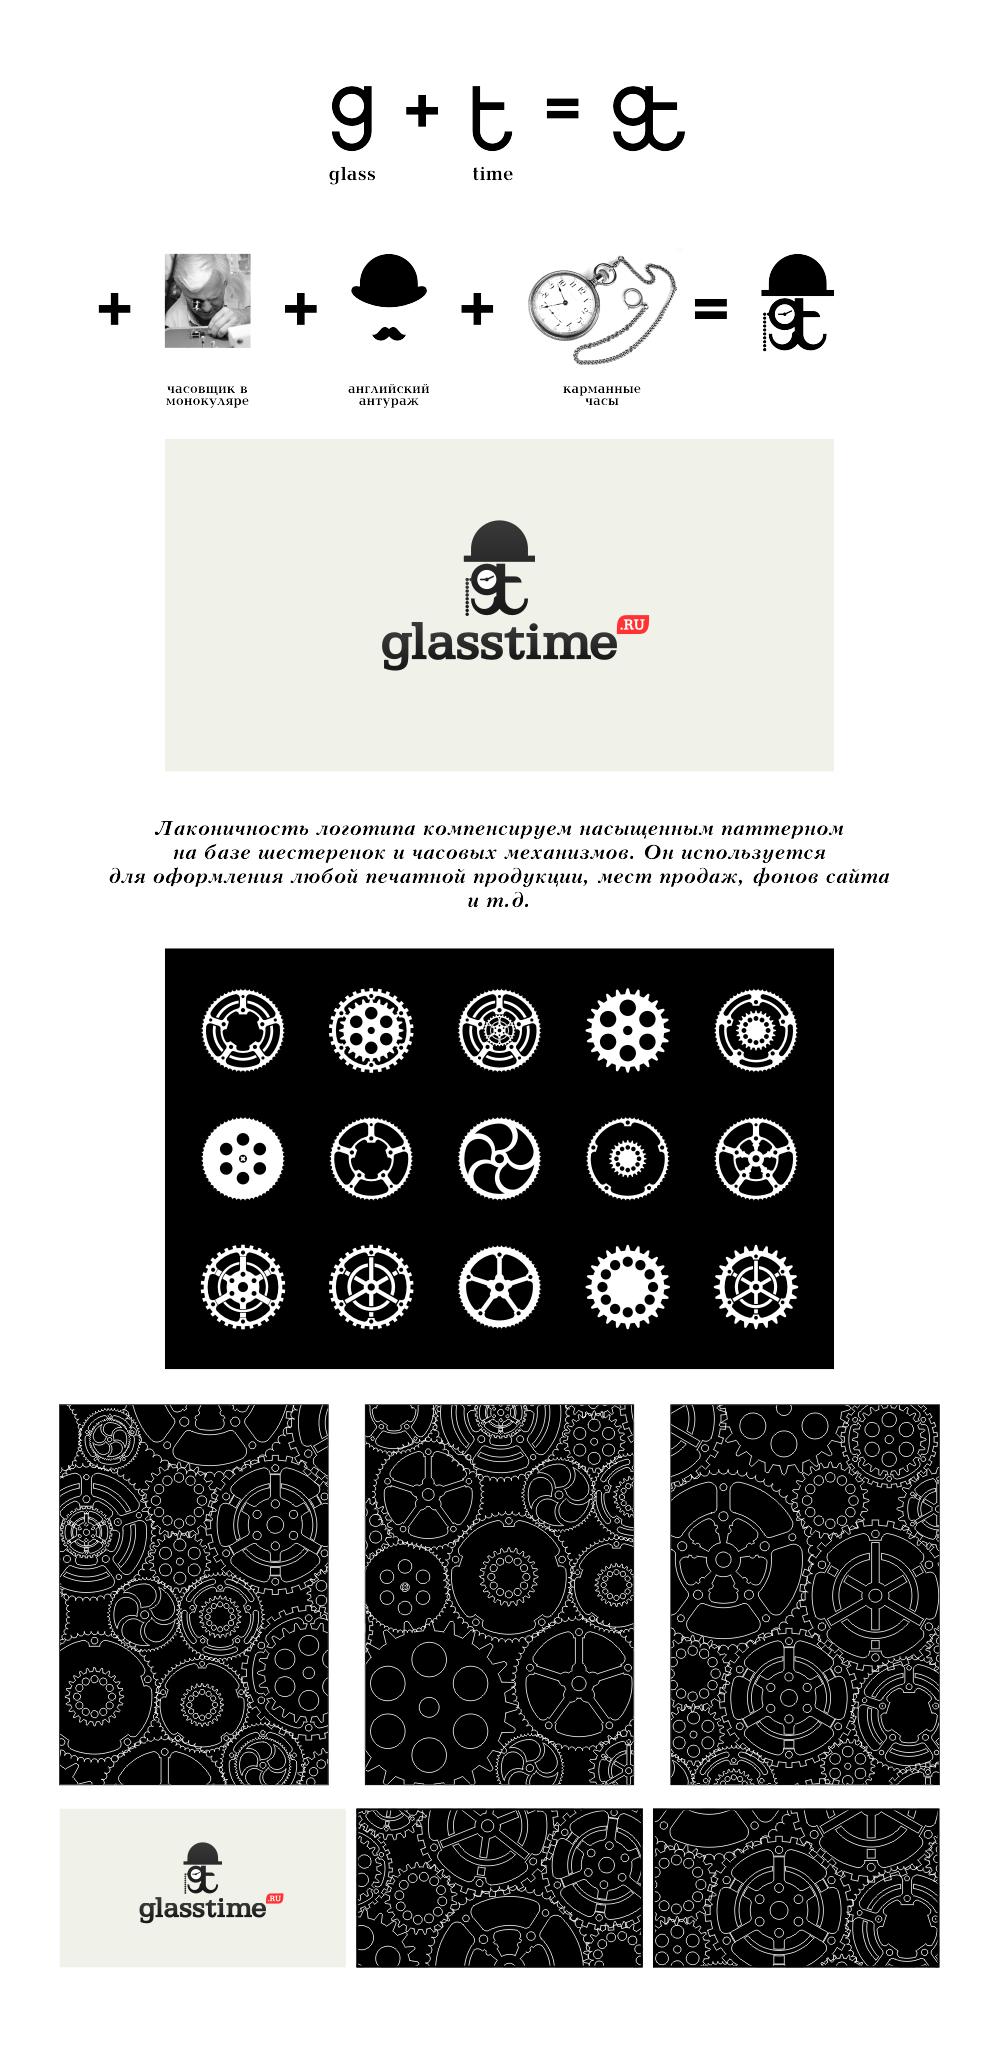 Glasstime